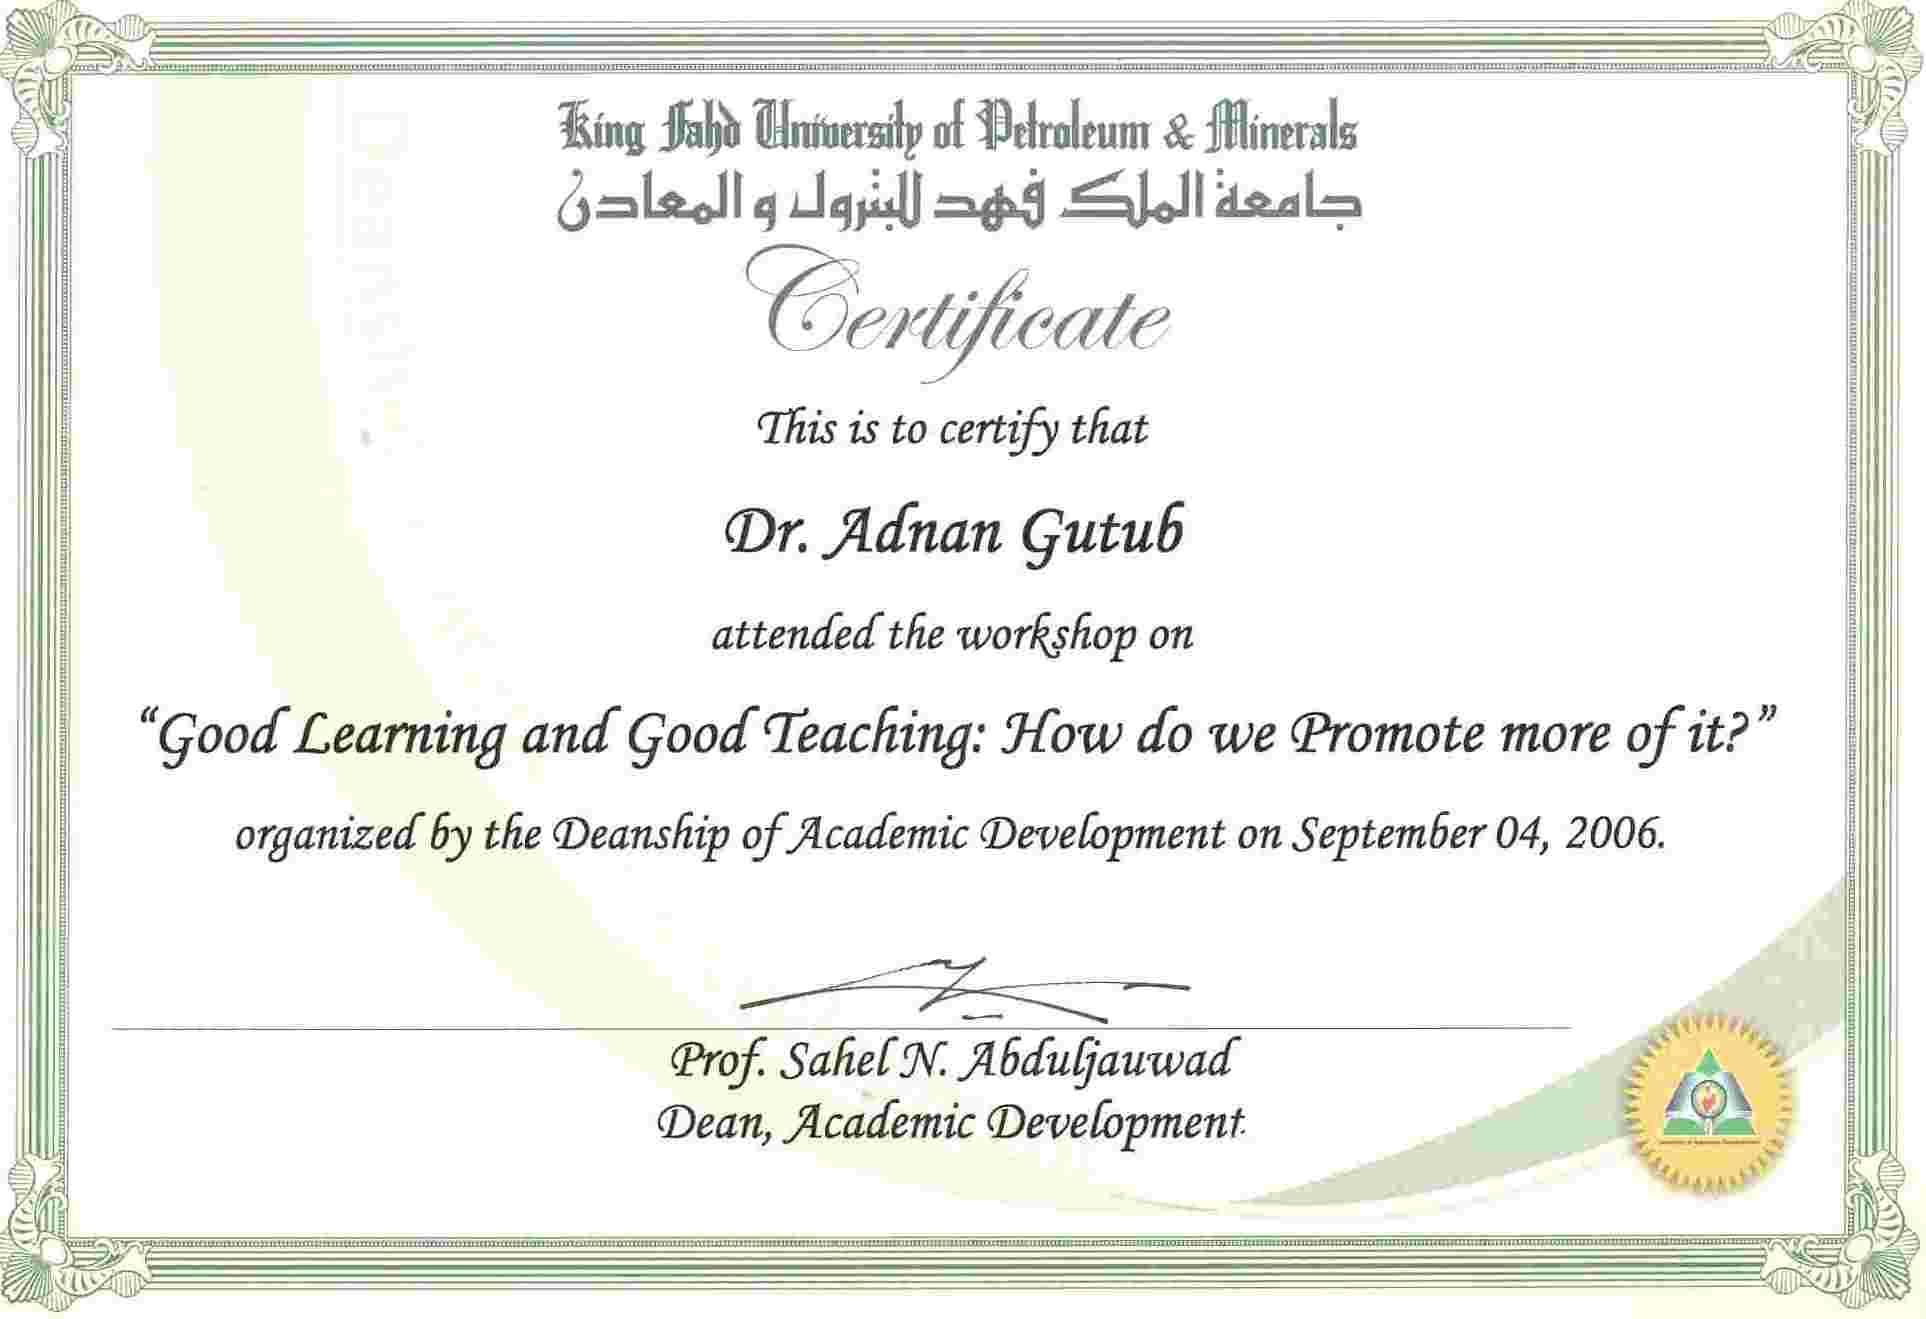 Professional Development Adnan Abdulaziz Muhammad Gutub Computer